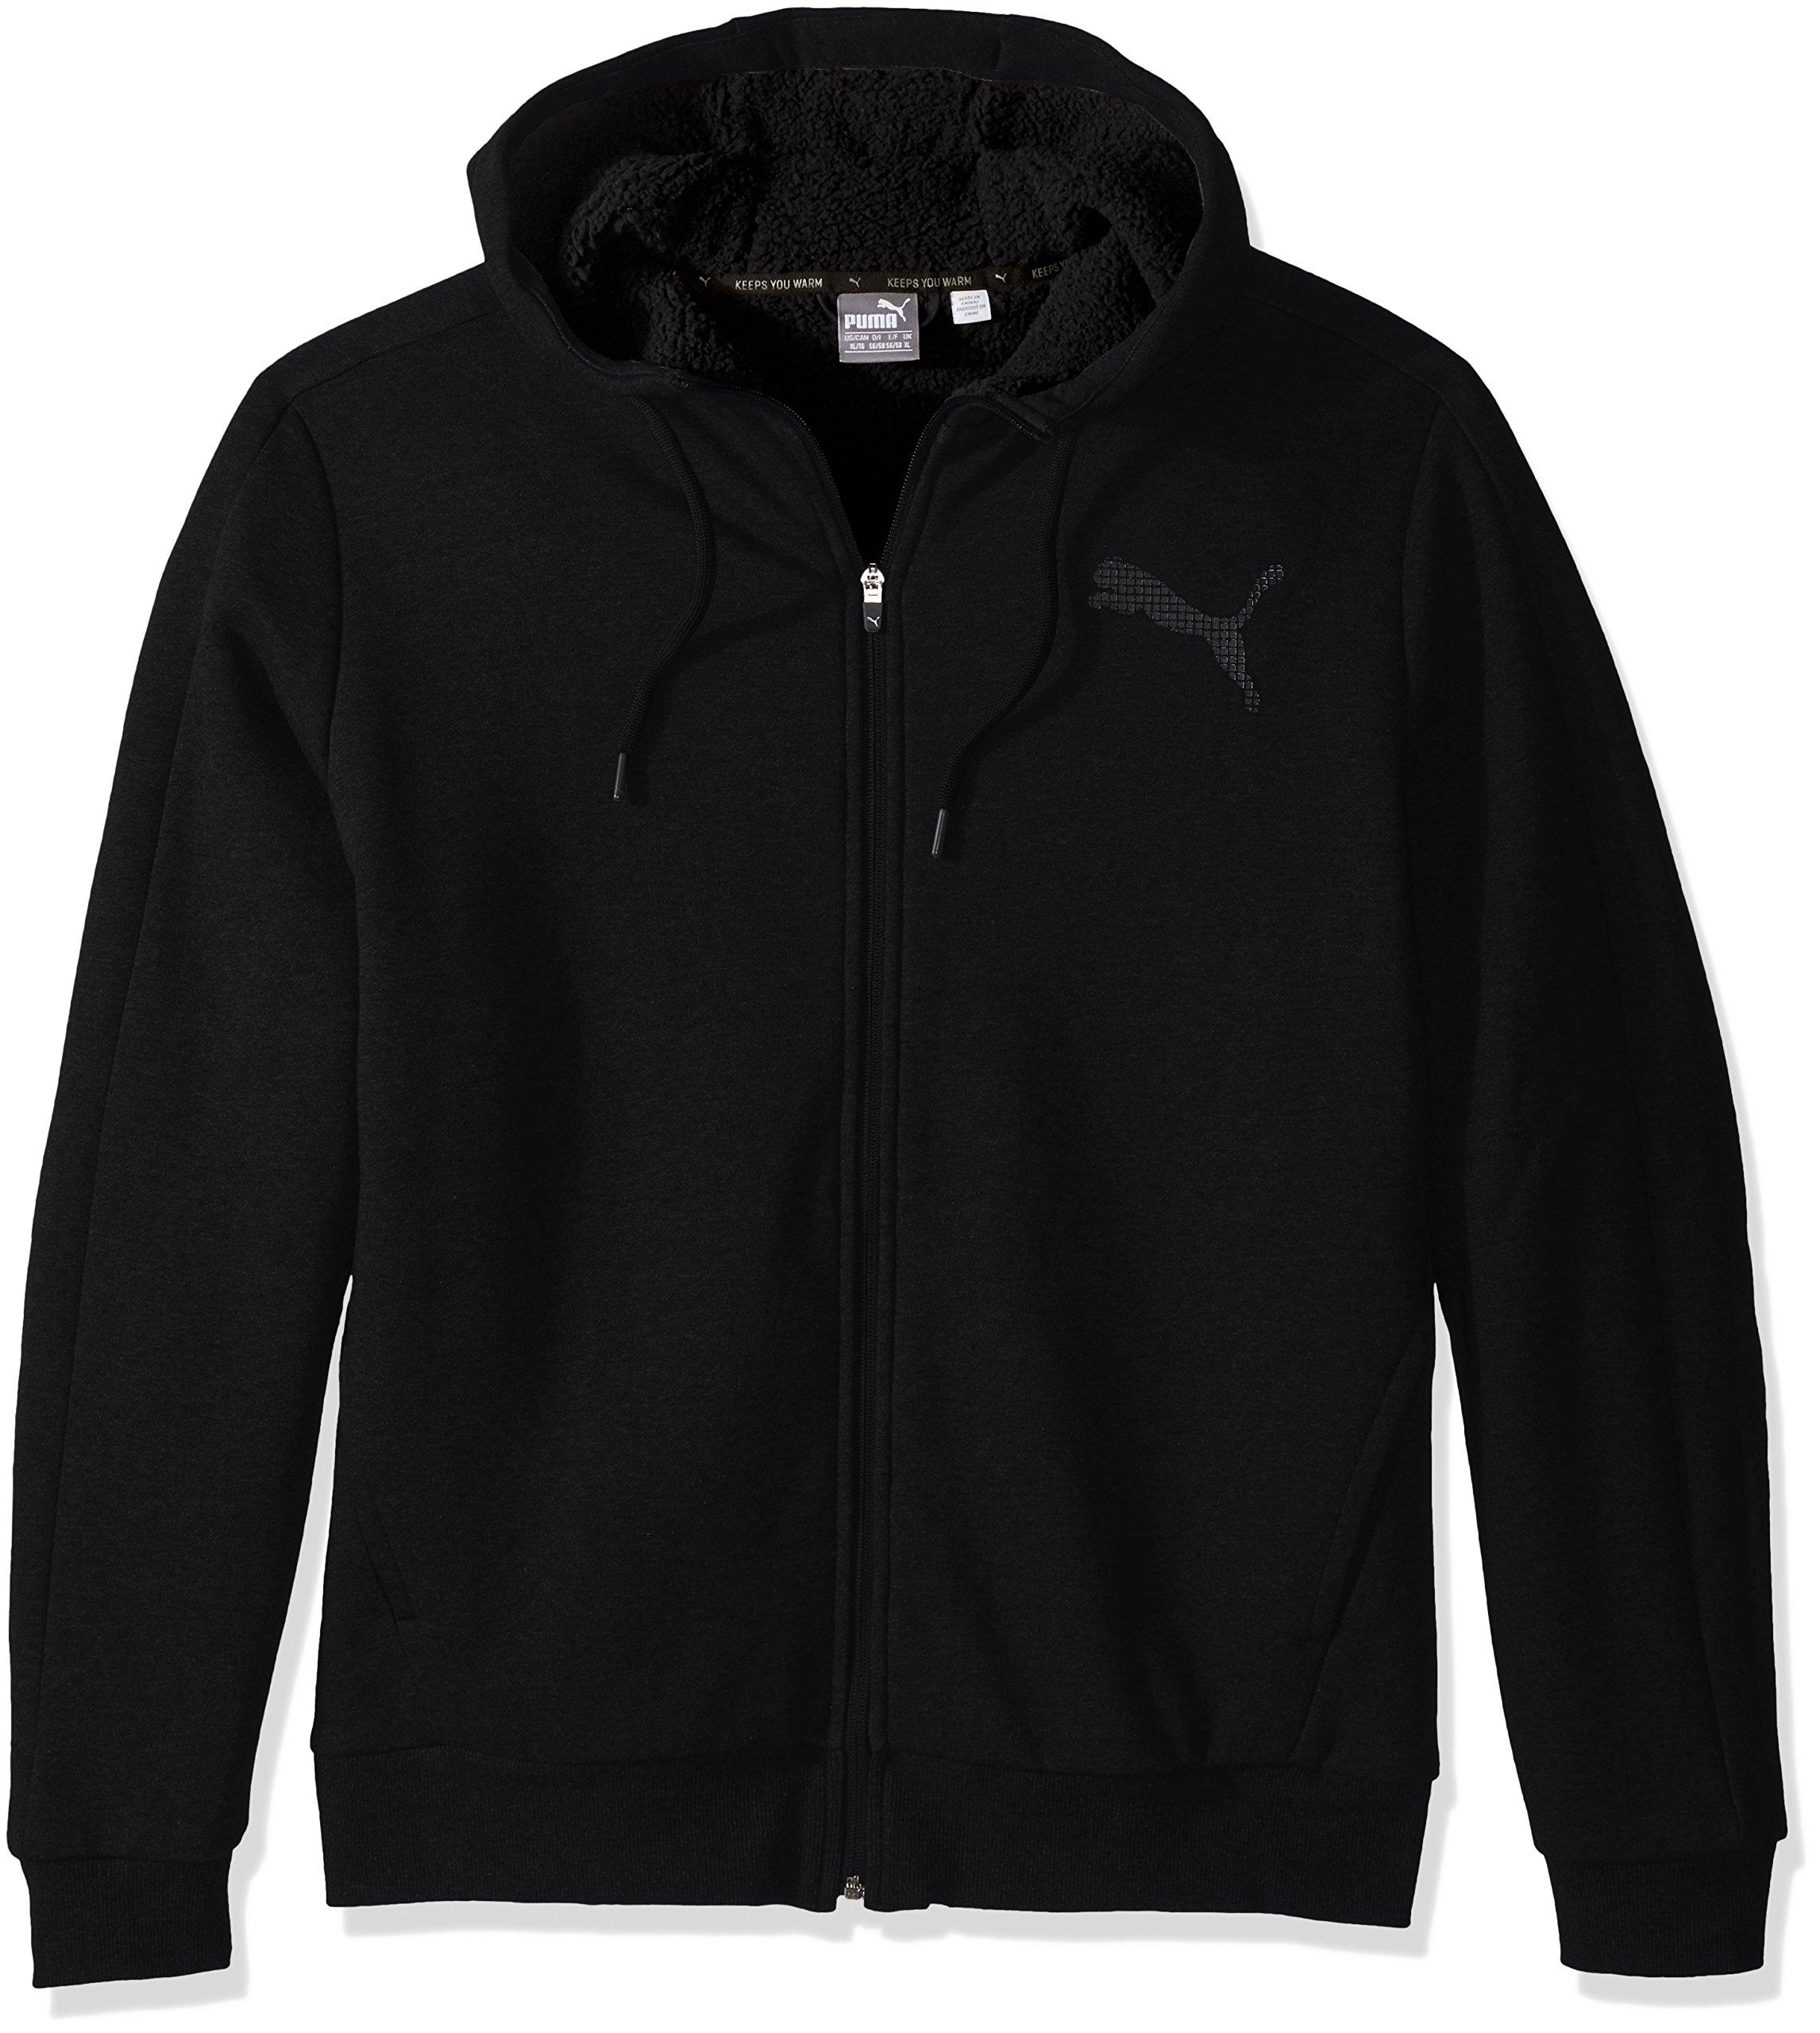 PUMA Men's Sherpa Full Zip Hoody, Cotton Cotton Black, XX-Large